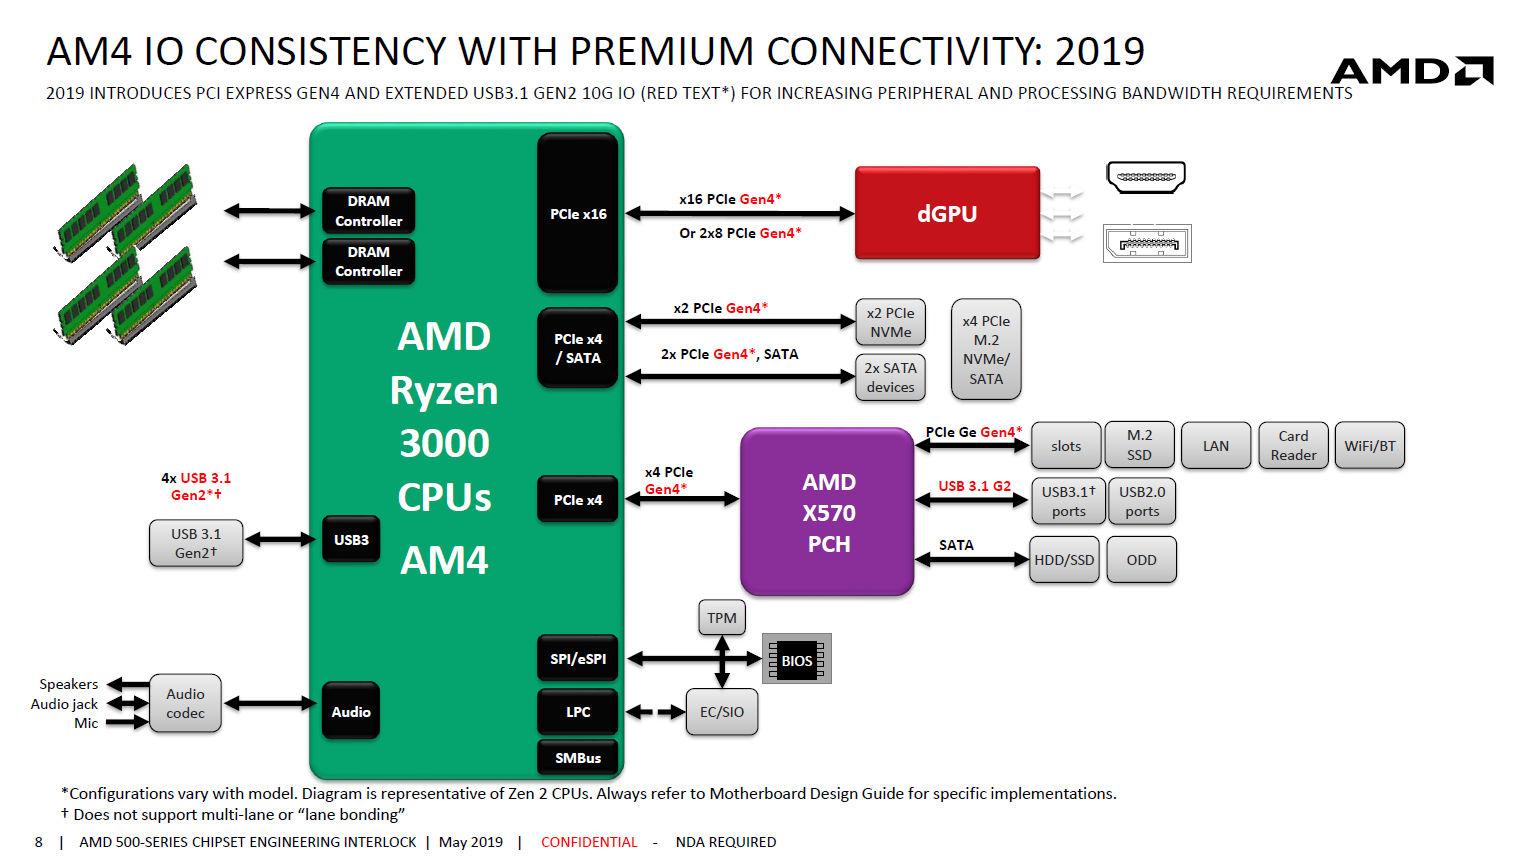 Amd X570 Chipset Blockdiagram Surfaces - Specs